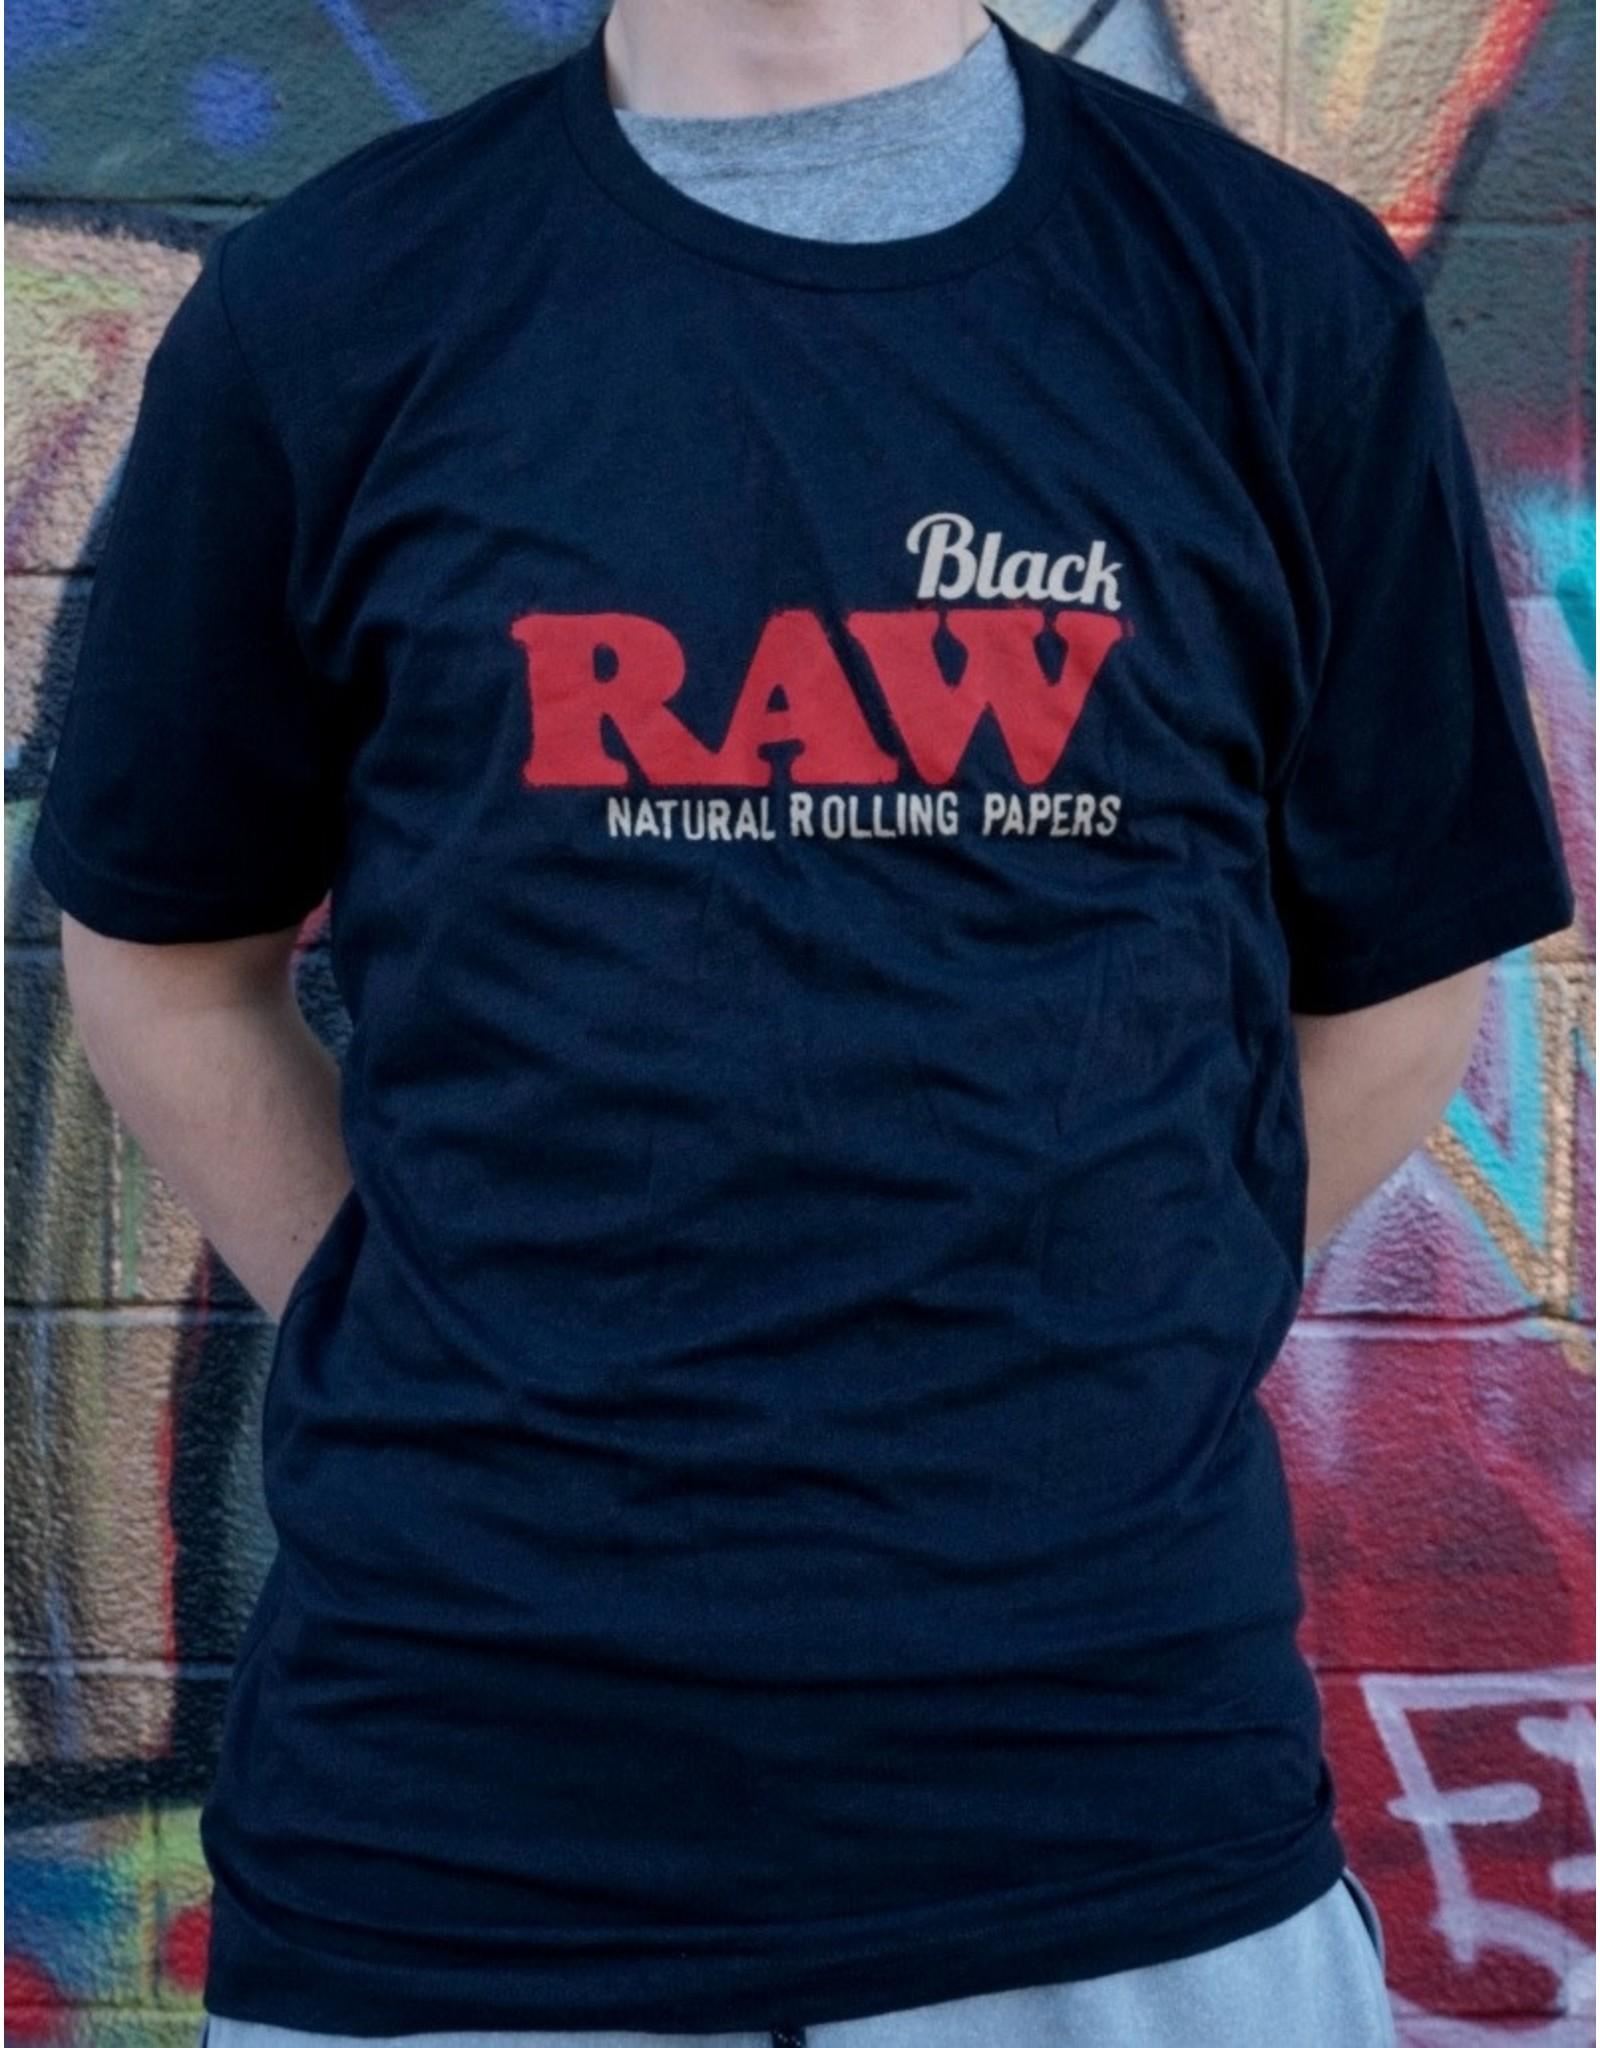 Raw Rawlife Black Taste Your Terps Shirt